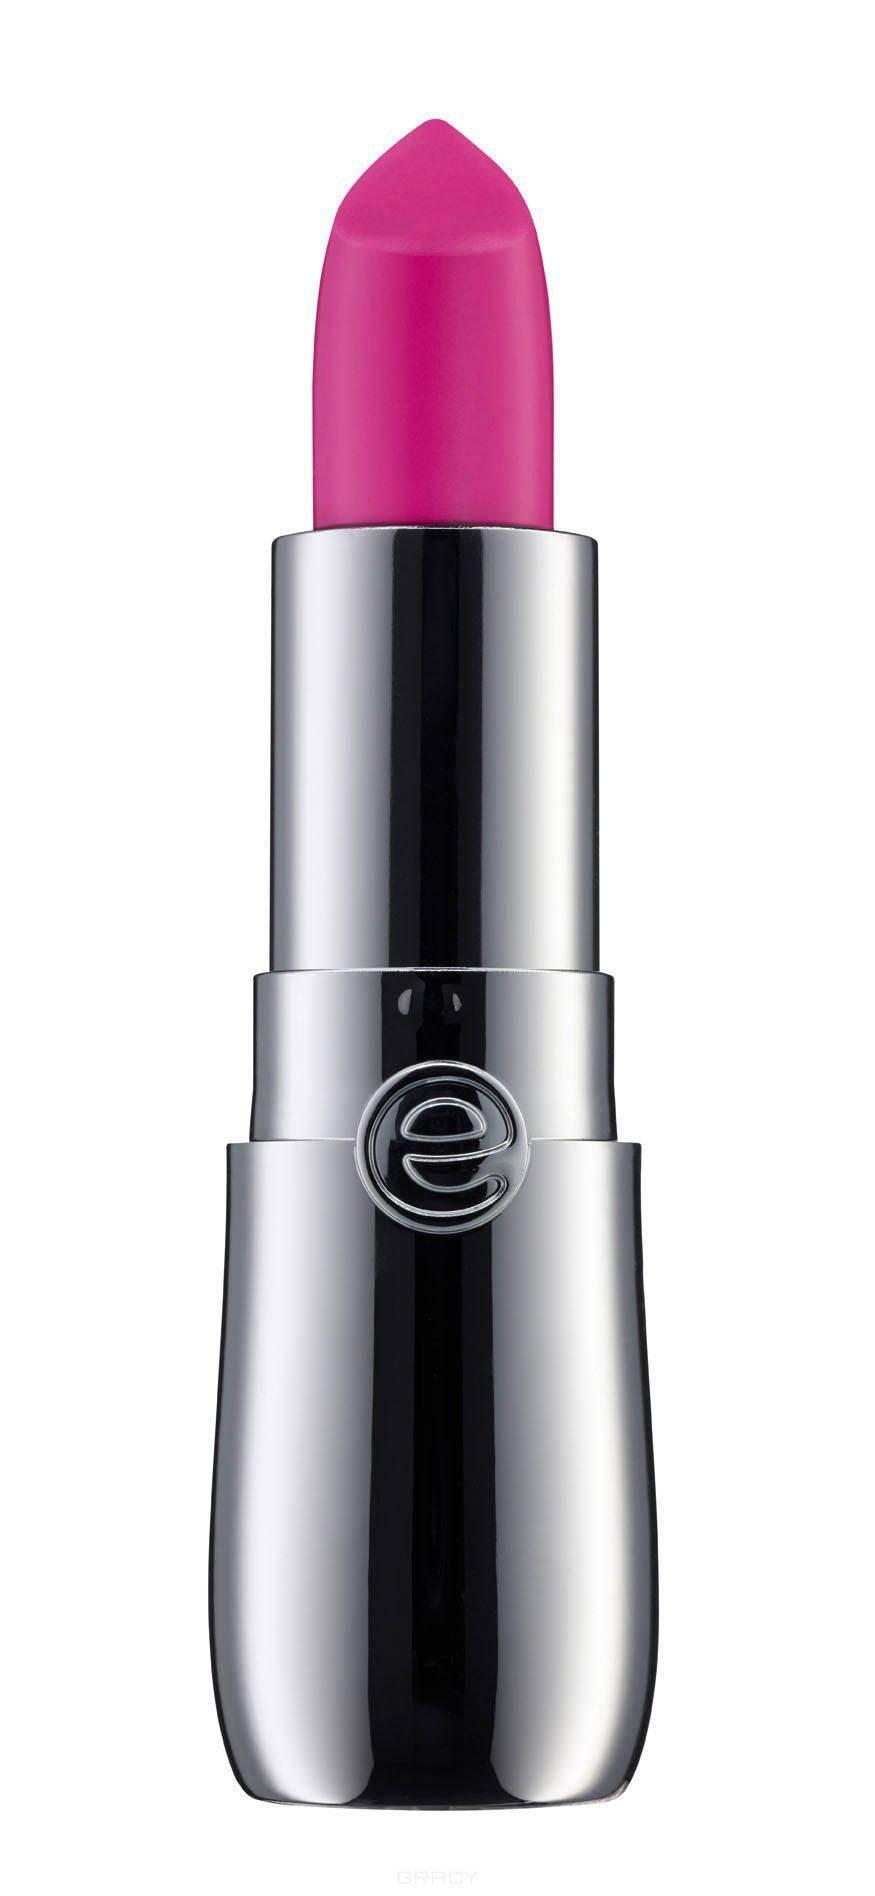 все цены на Essence, Сияющая губная помада Colour Up! Shine On! Lipstick, 3.5 гр (12 тонов) №07, пурпурно-розовый онлайн